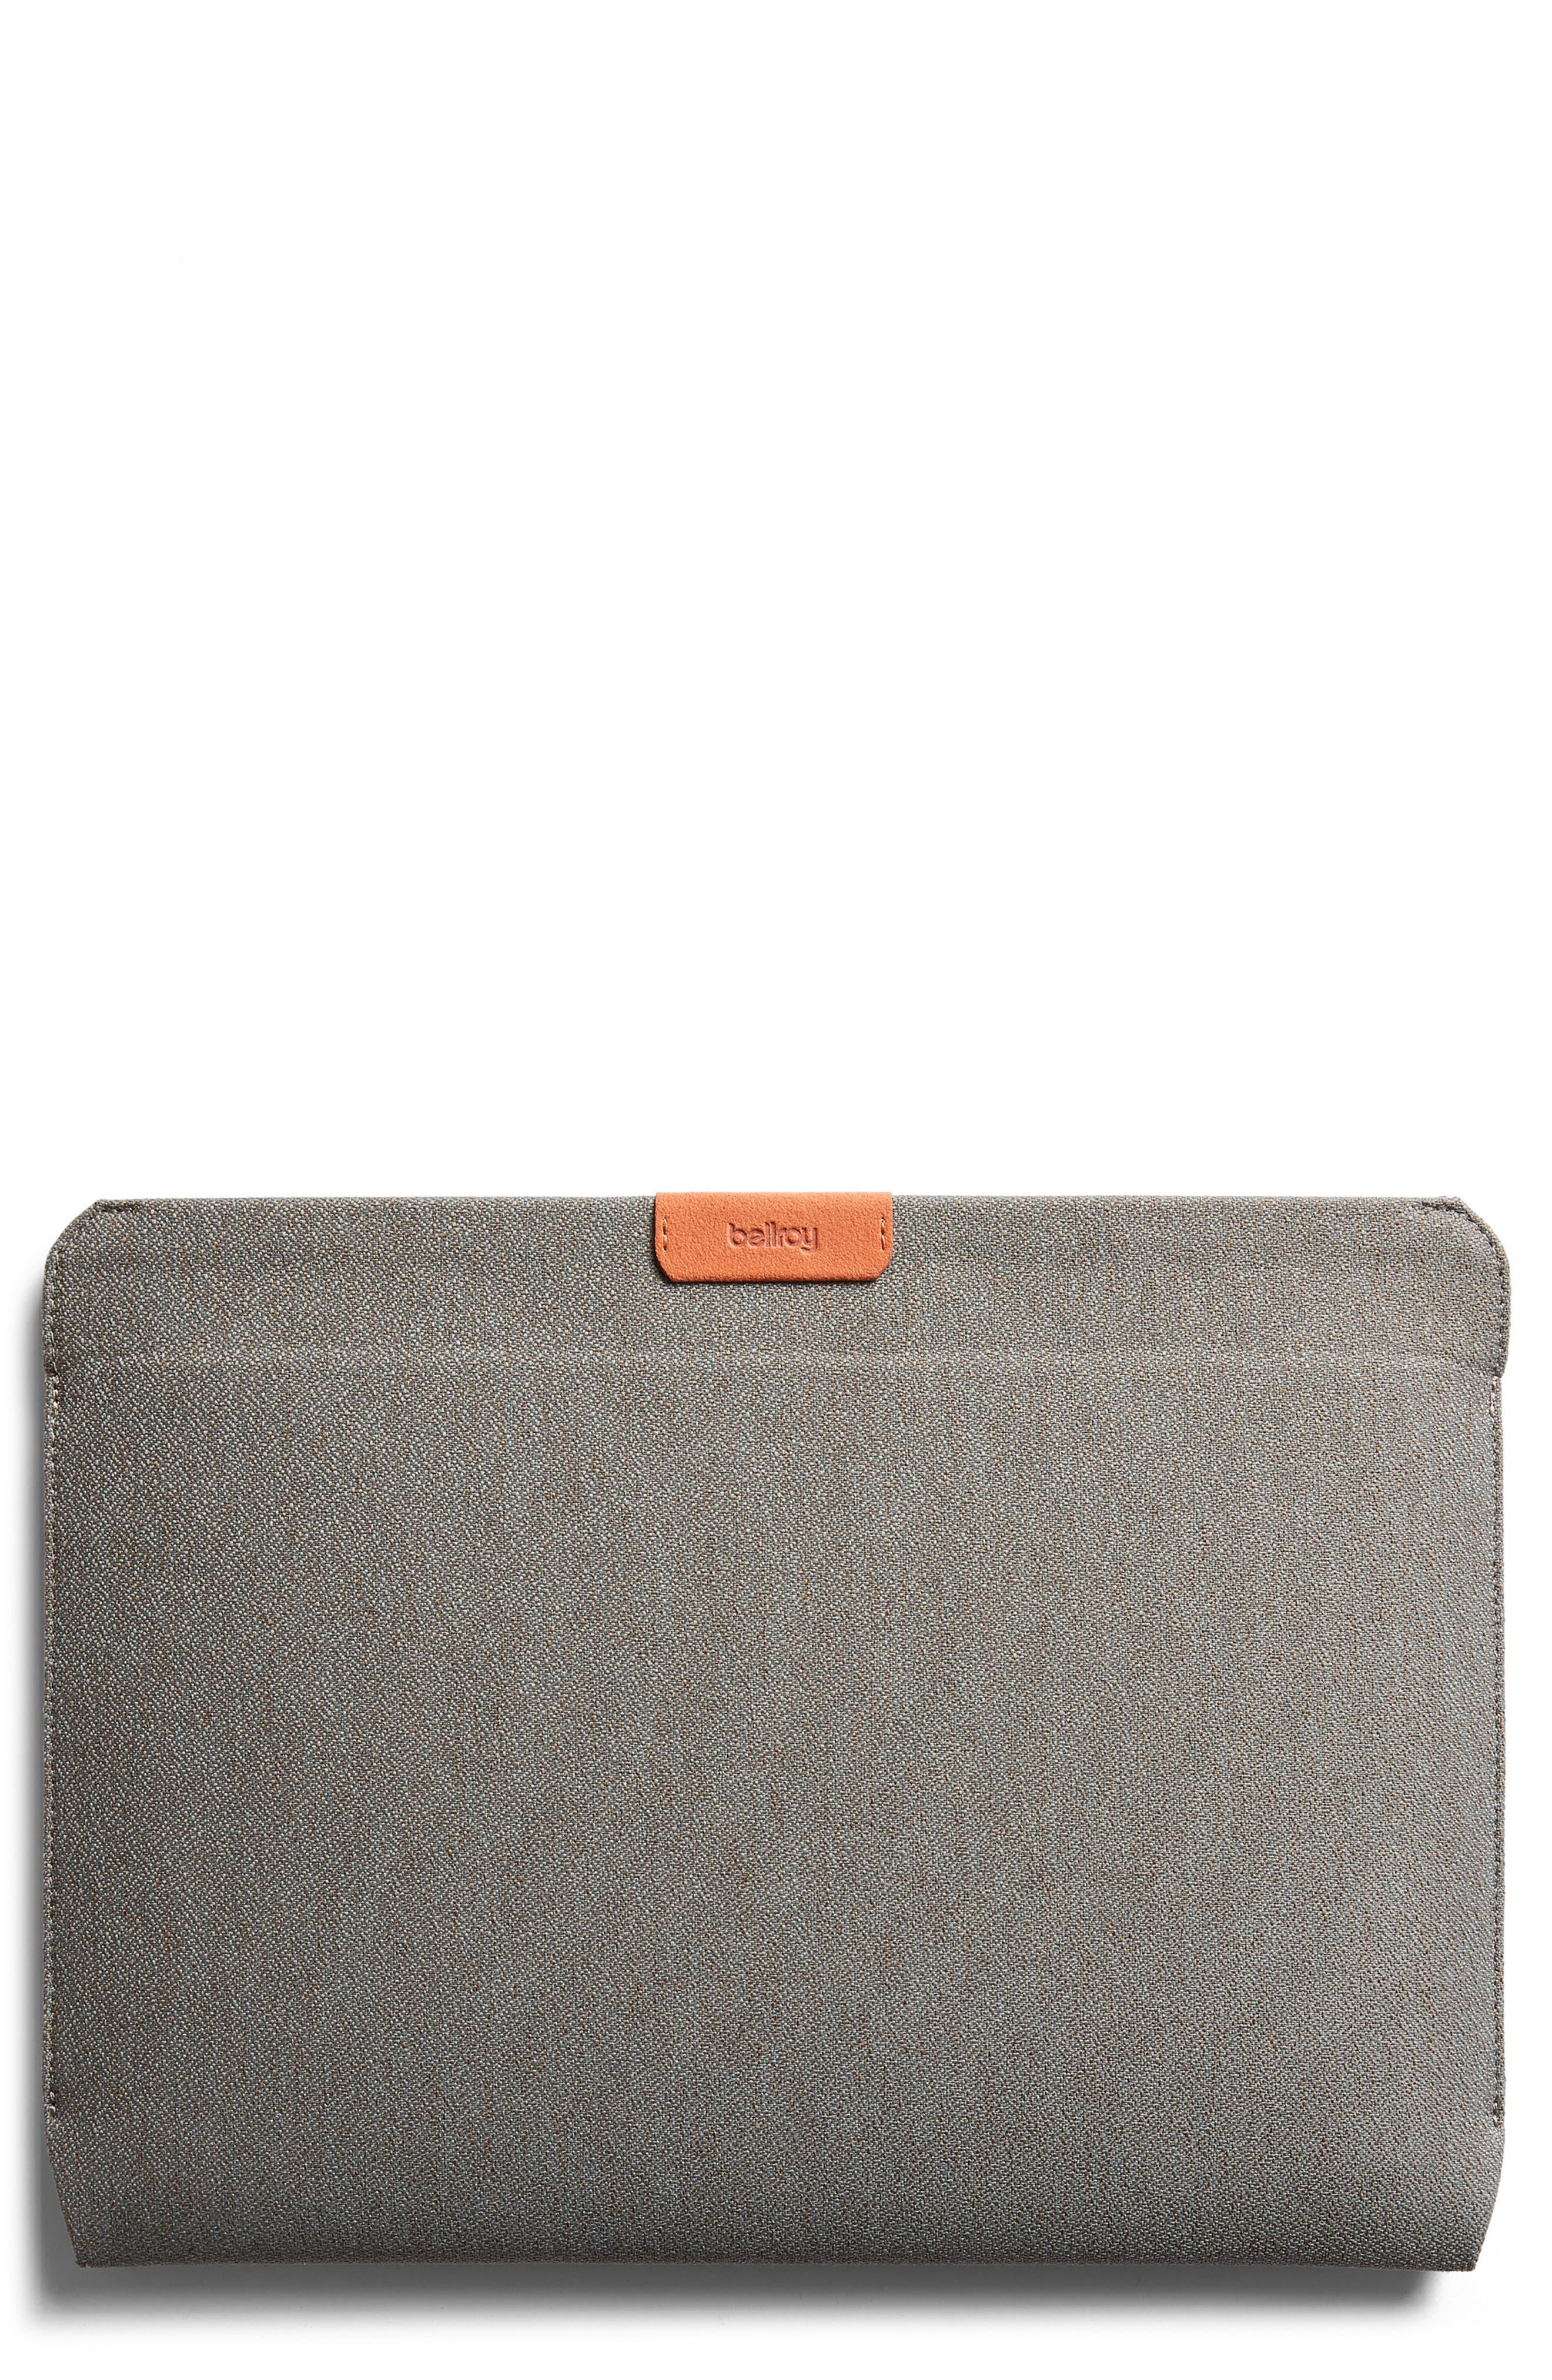 13-Inch Laptop Sleeve